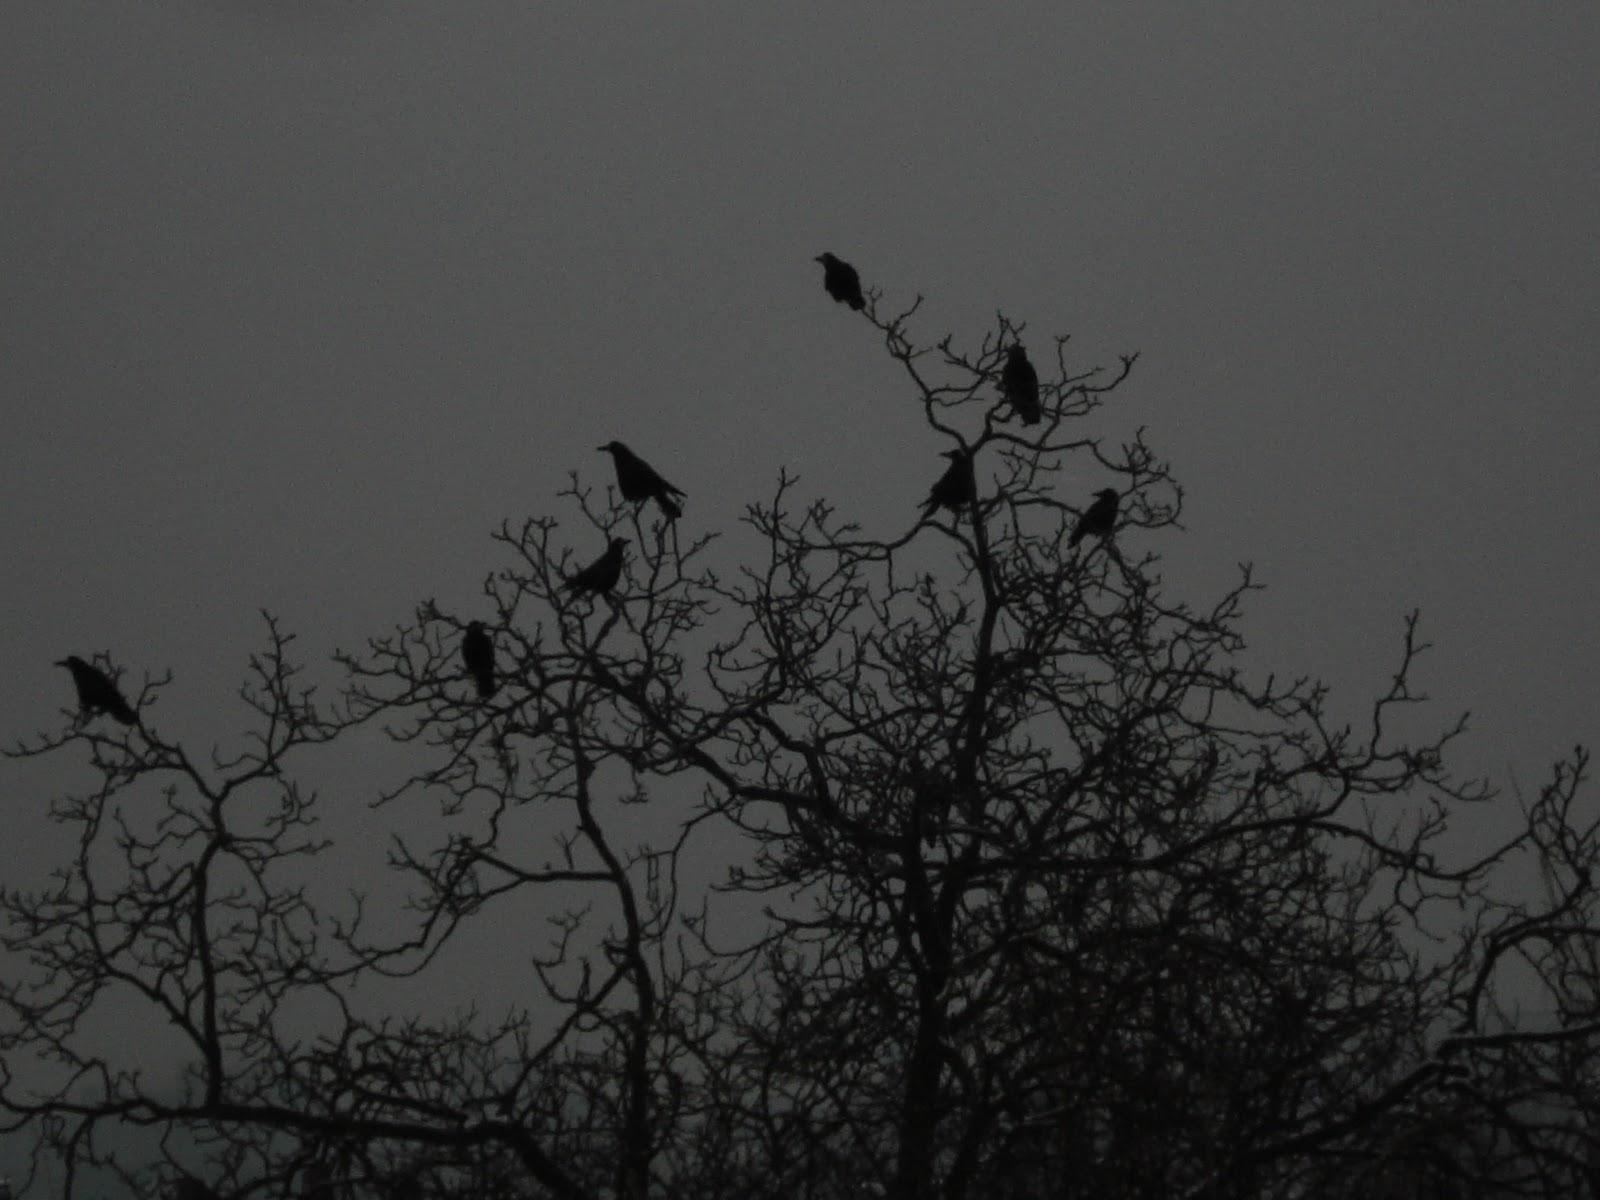 Schwarzer Tag